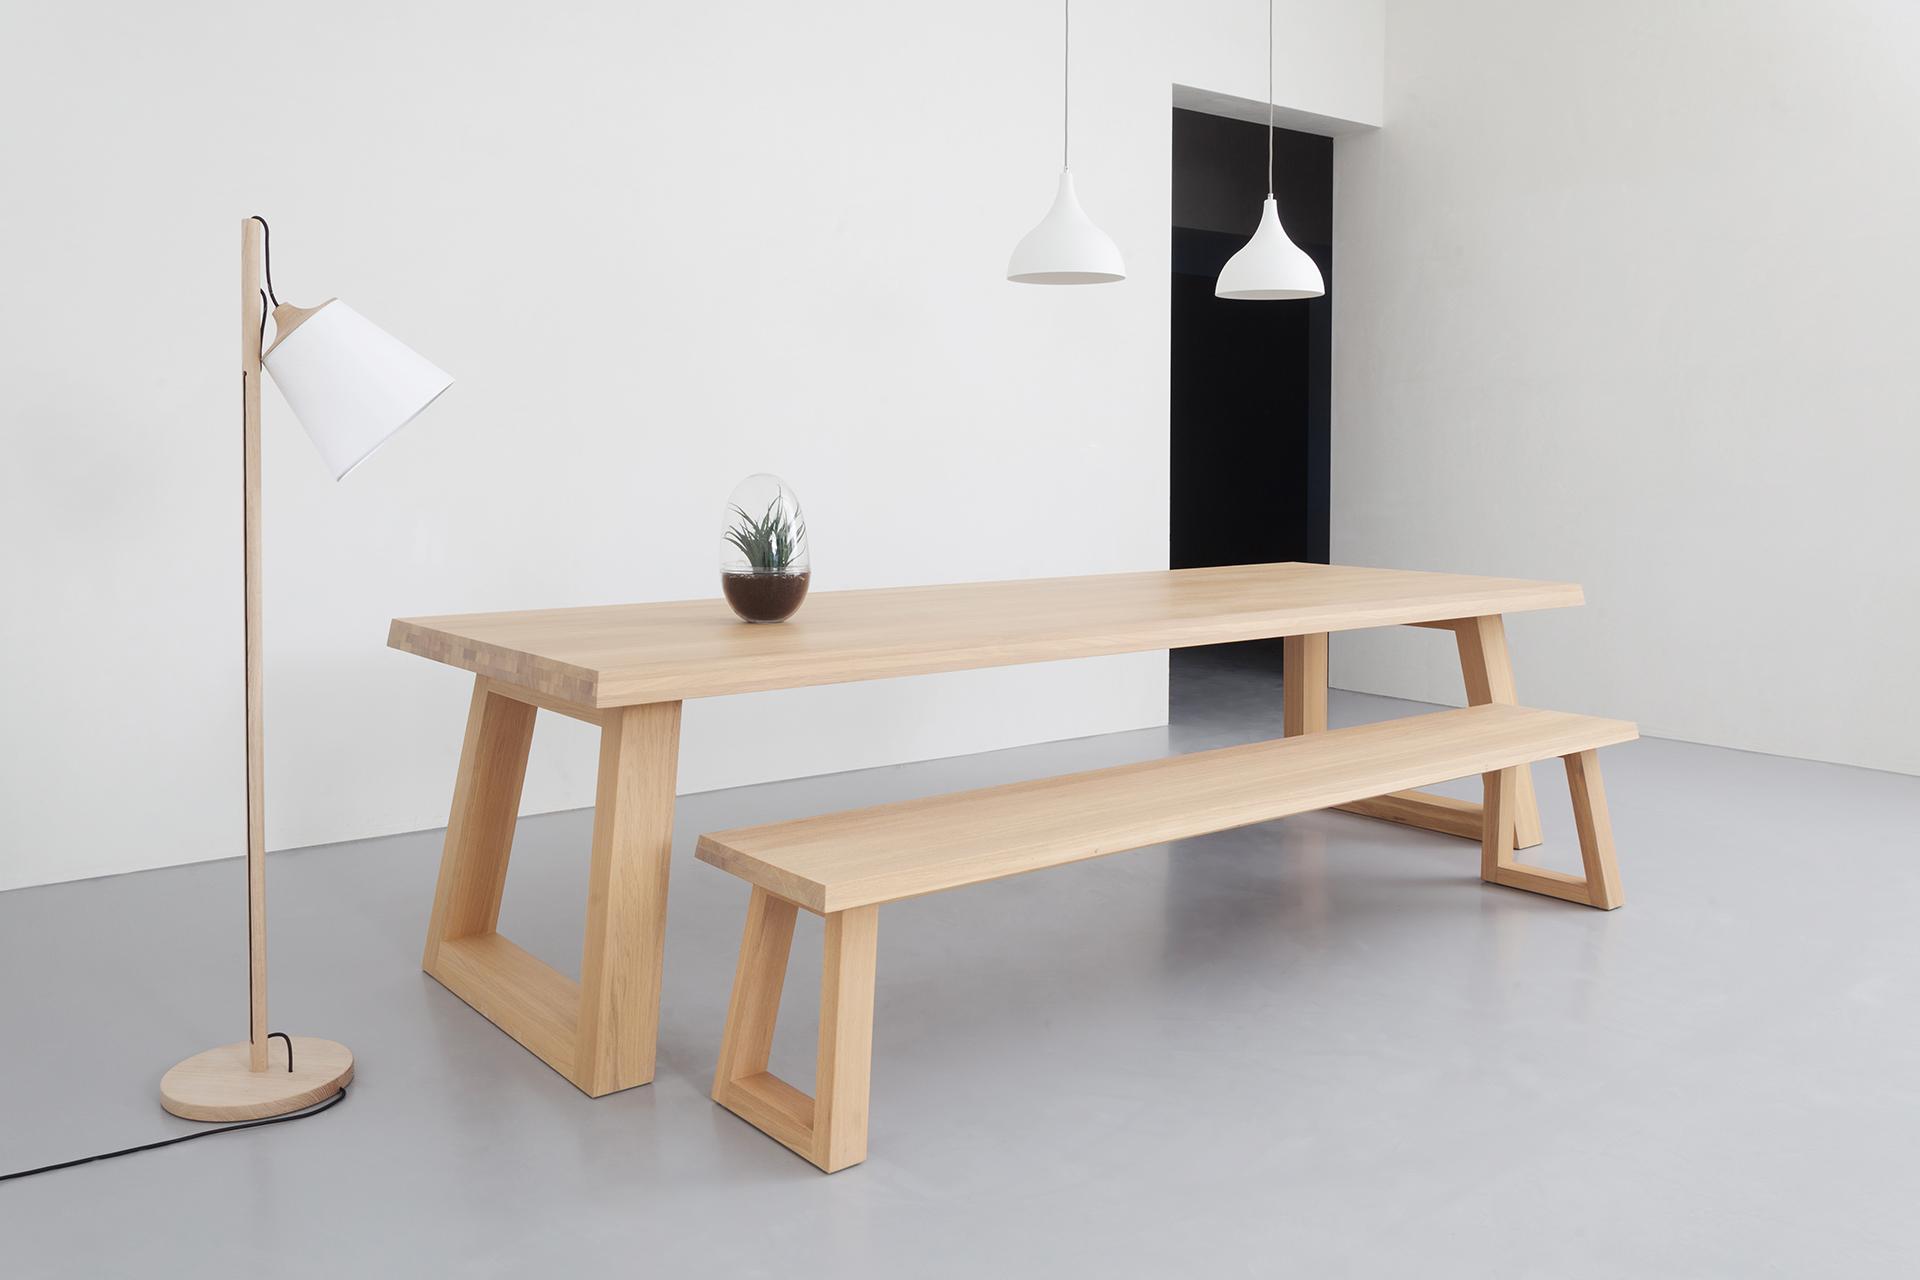 Design Eettafel Bank.Design Dining Table Slide L Remy Meijers L Odesi Your Dutch Design